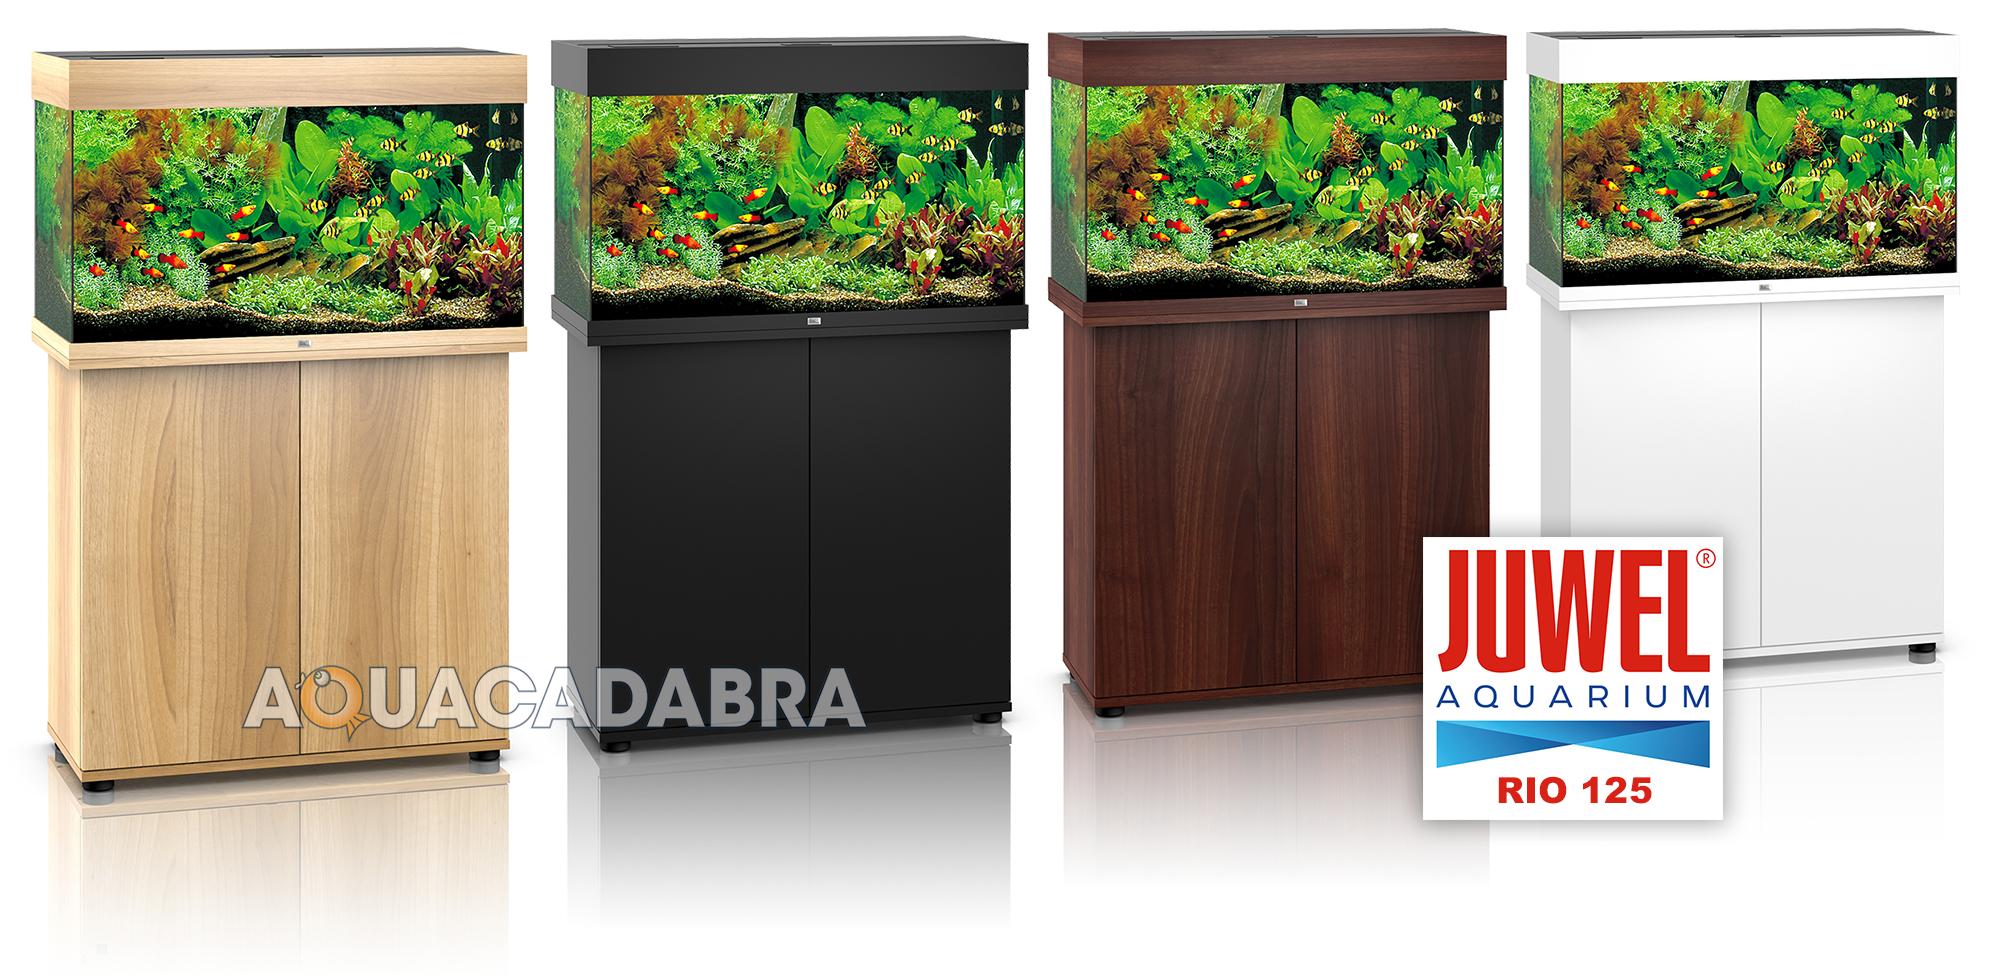 Cabinet aquarium fish tank tropical - Juwel Aquarium Fish Tank Cabinet Rio Trigon Vision